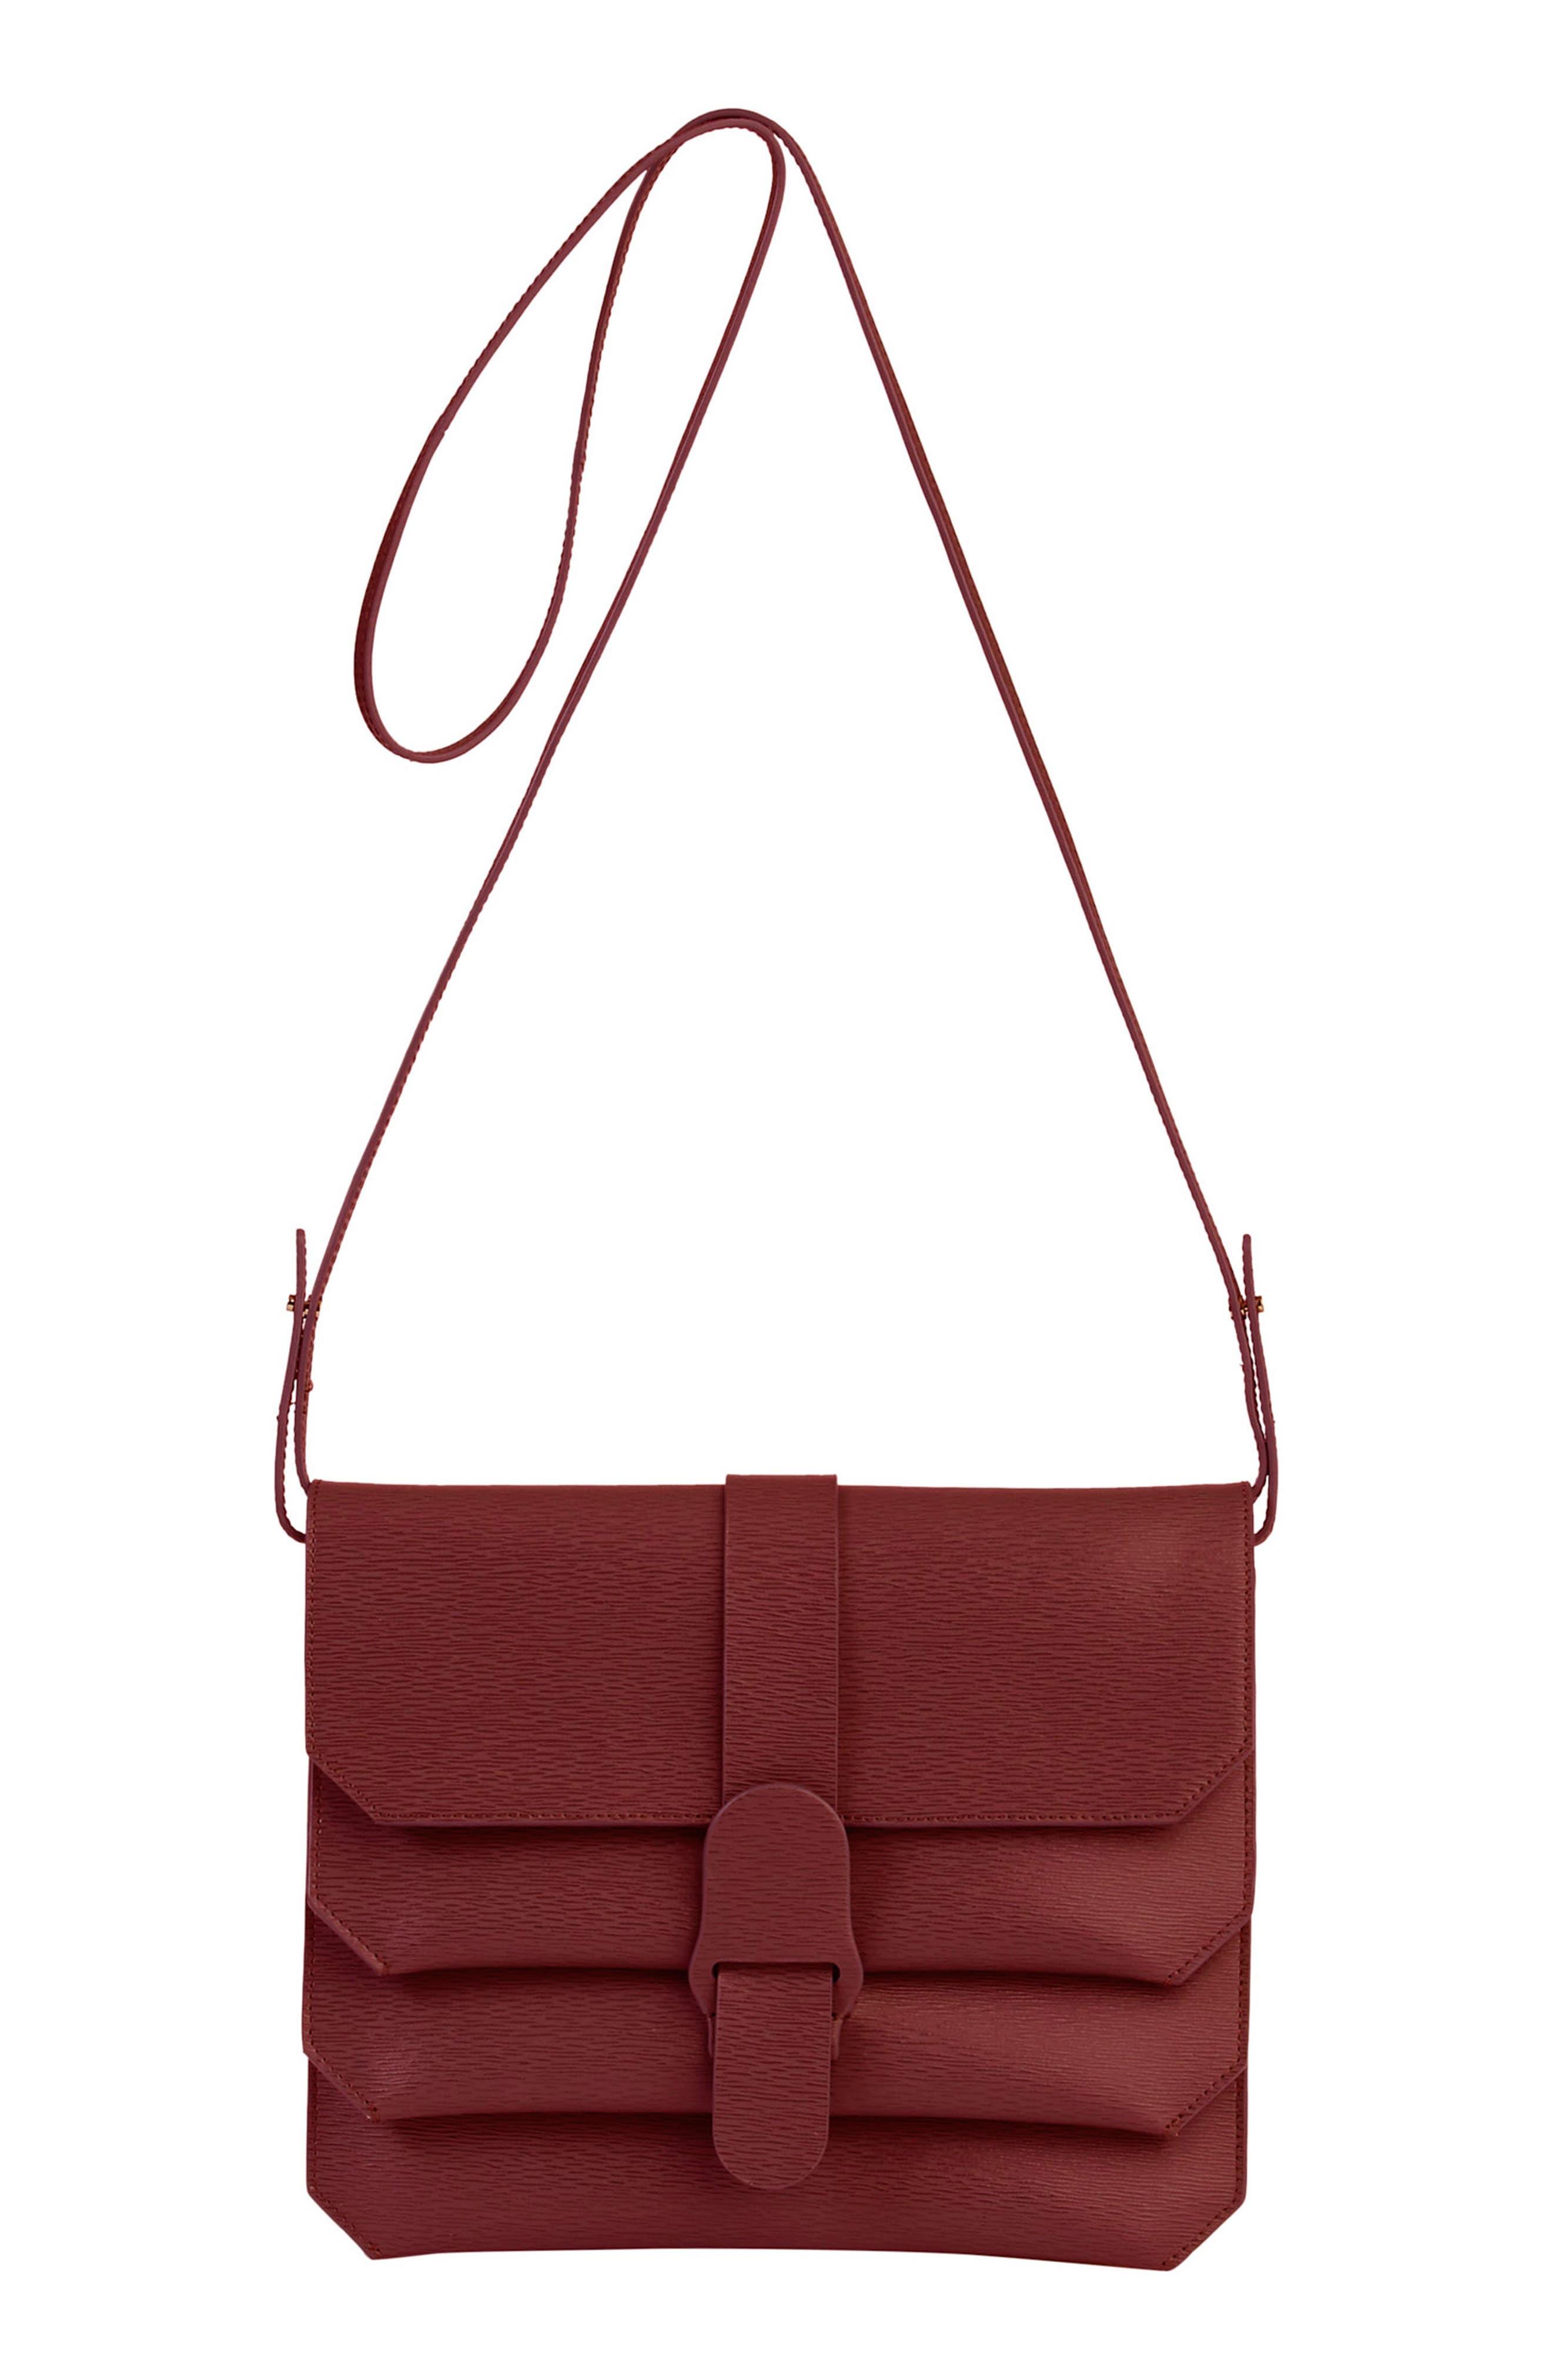 Alternate Image 1 Selected - Senreve Mimosa Textured Leather Crossbody Bag